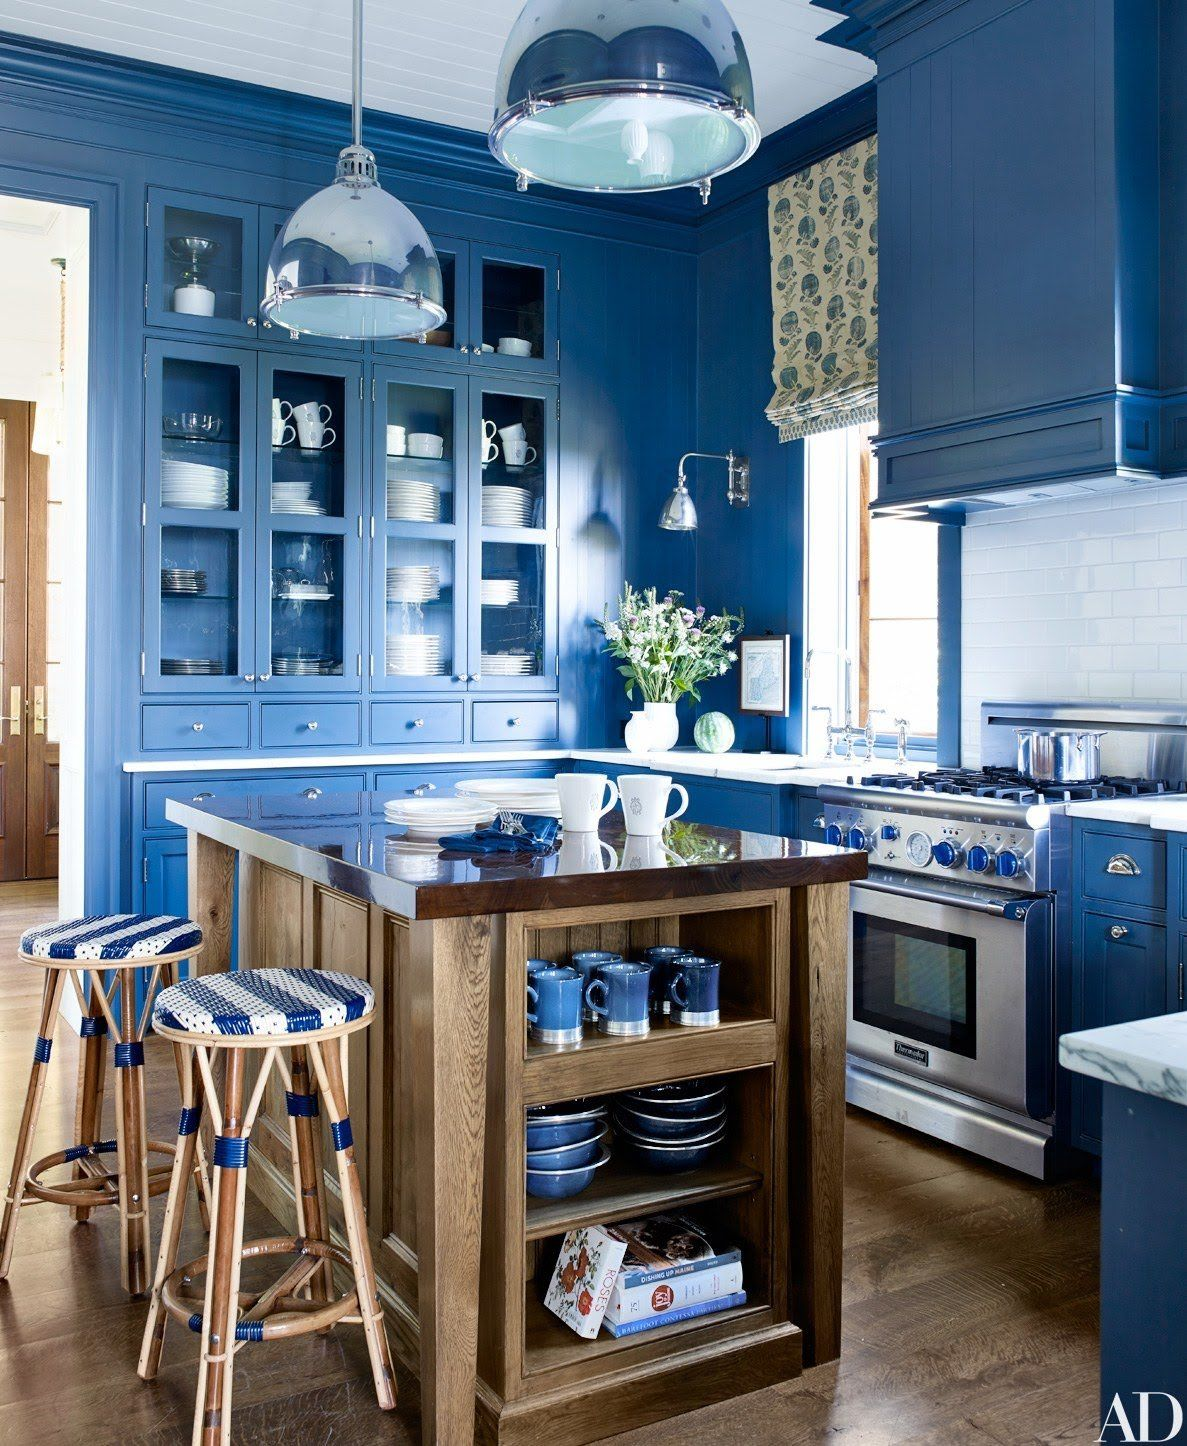 Painted Kitchen Cabinet Ideas Kitchen Inspirations Kitchen Colors Kitchen Design